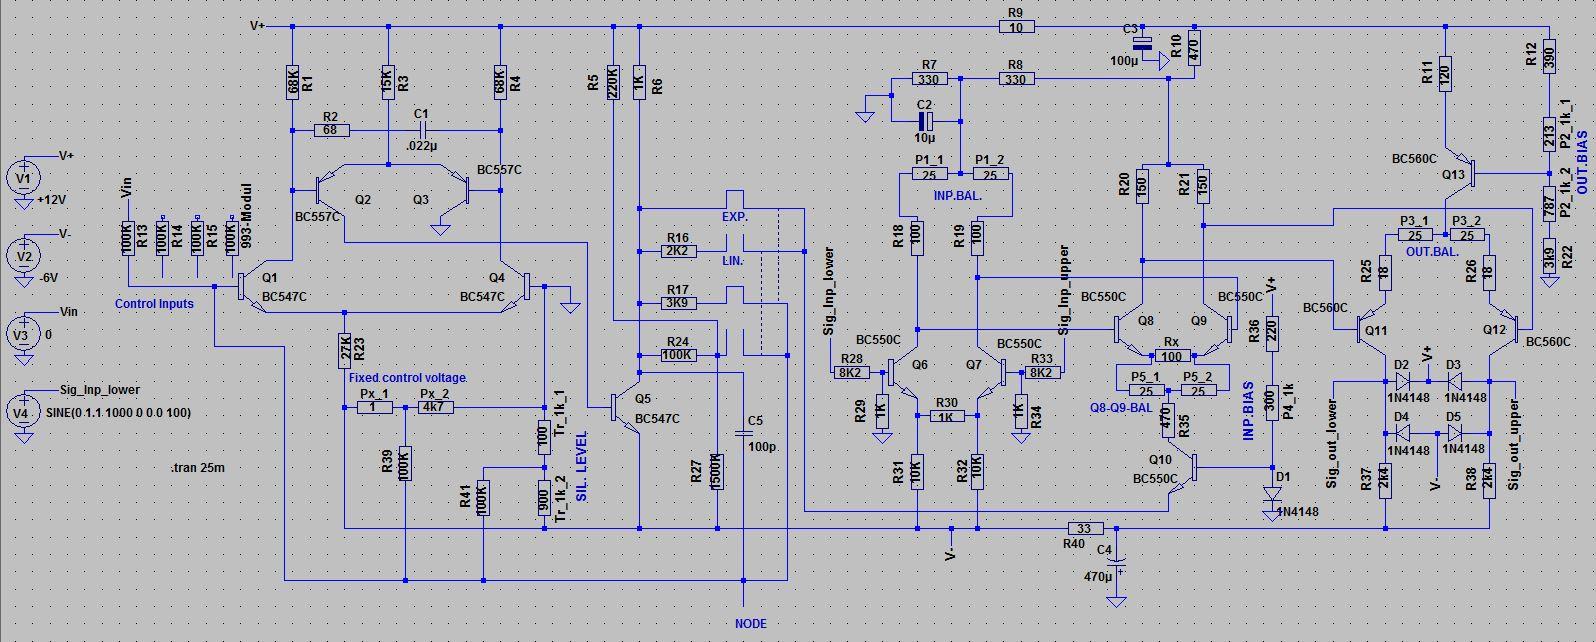 Moog Modular Clone Project Schematics Vco Circuit Diagram T901a Voltage Controlled Oscillator Controller Schematic T901b